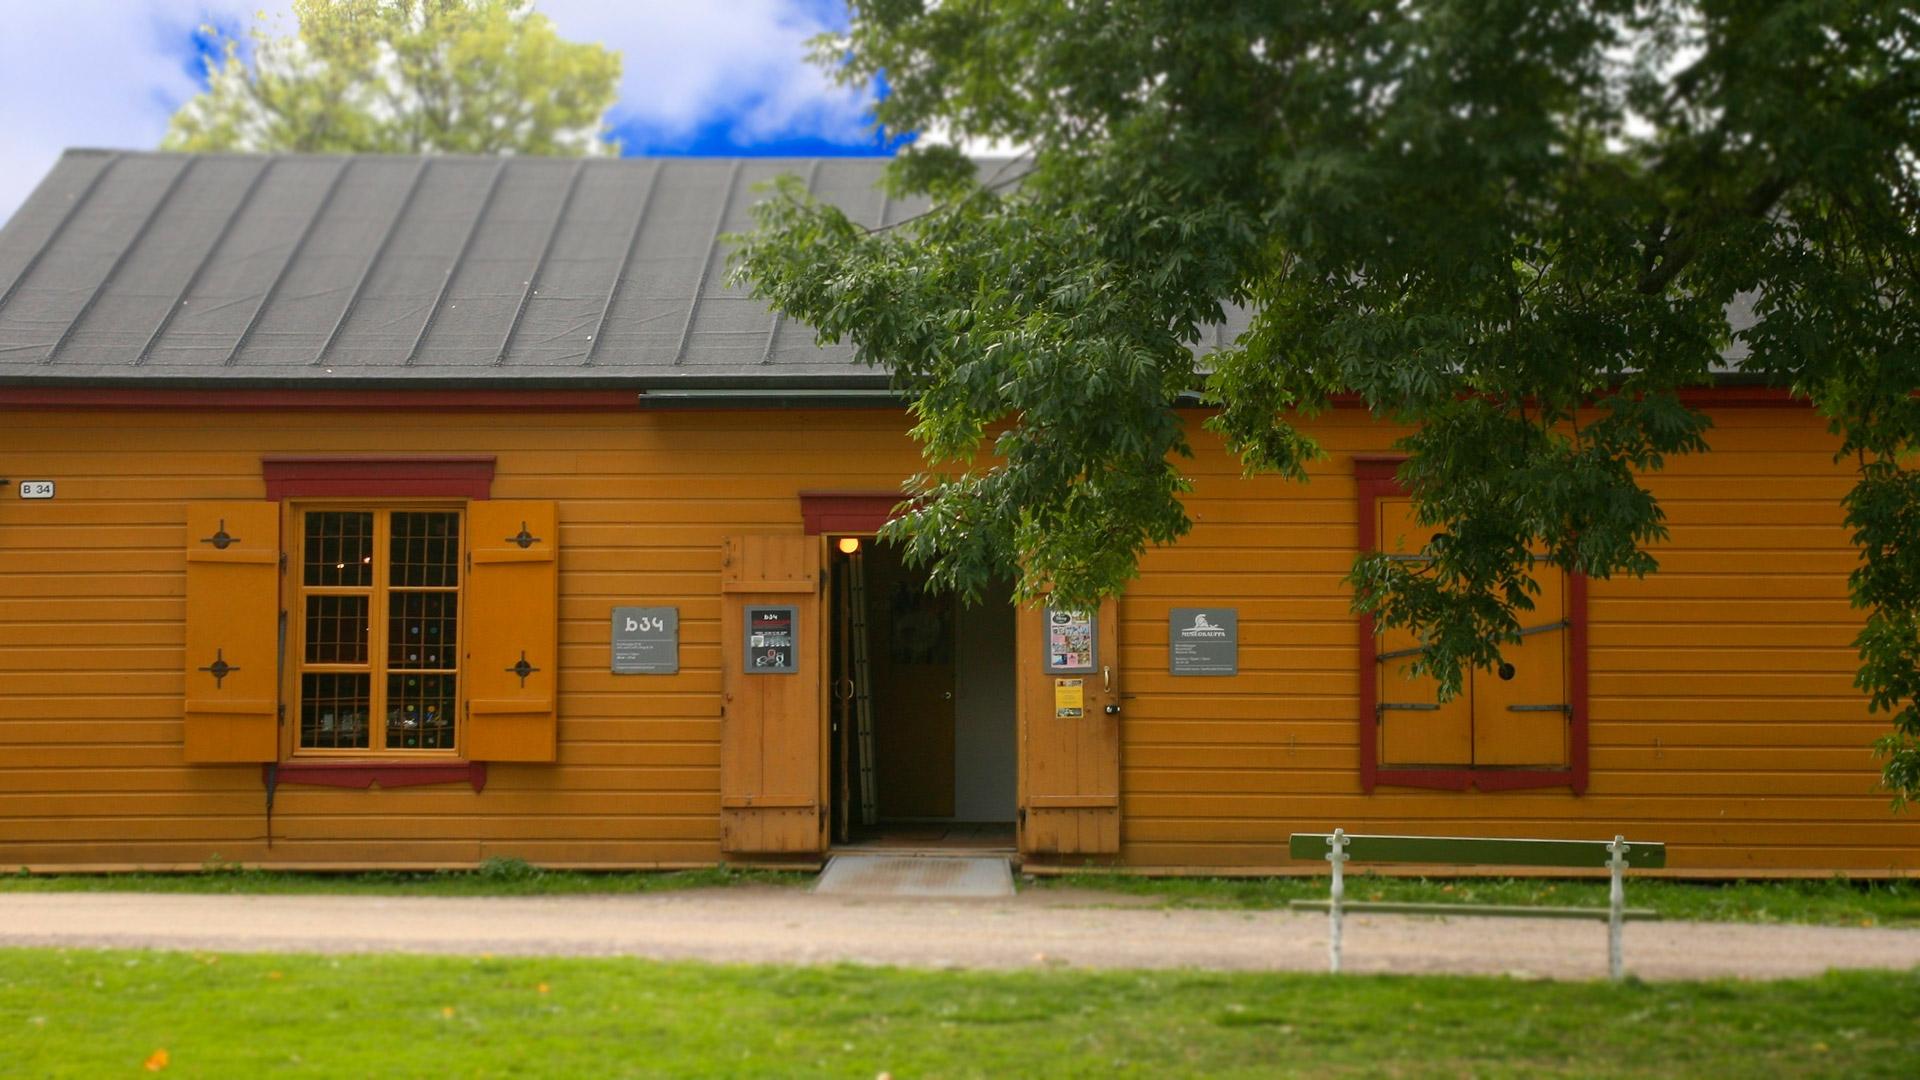 Suomenlinnan museokauppa